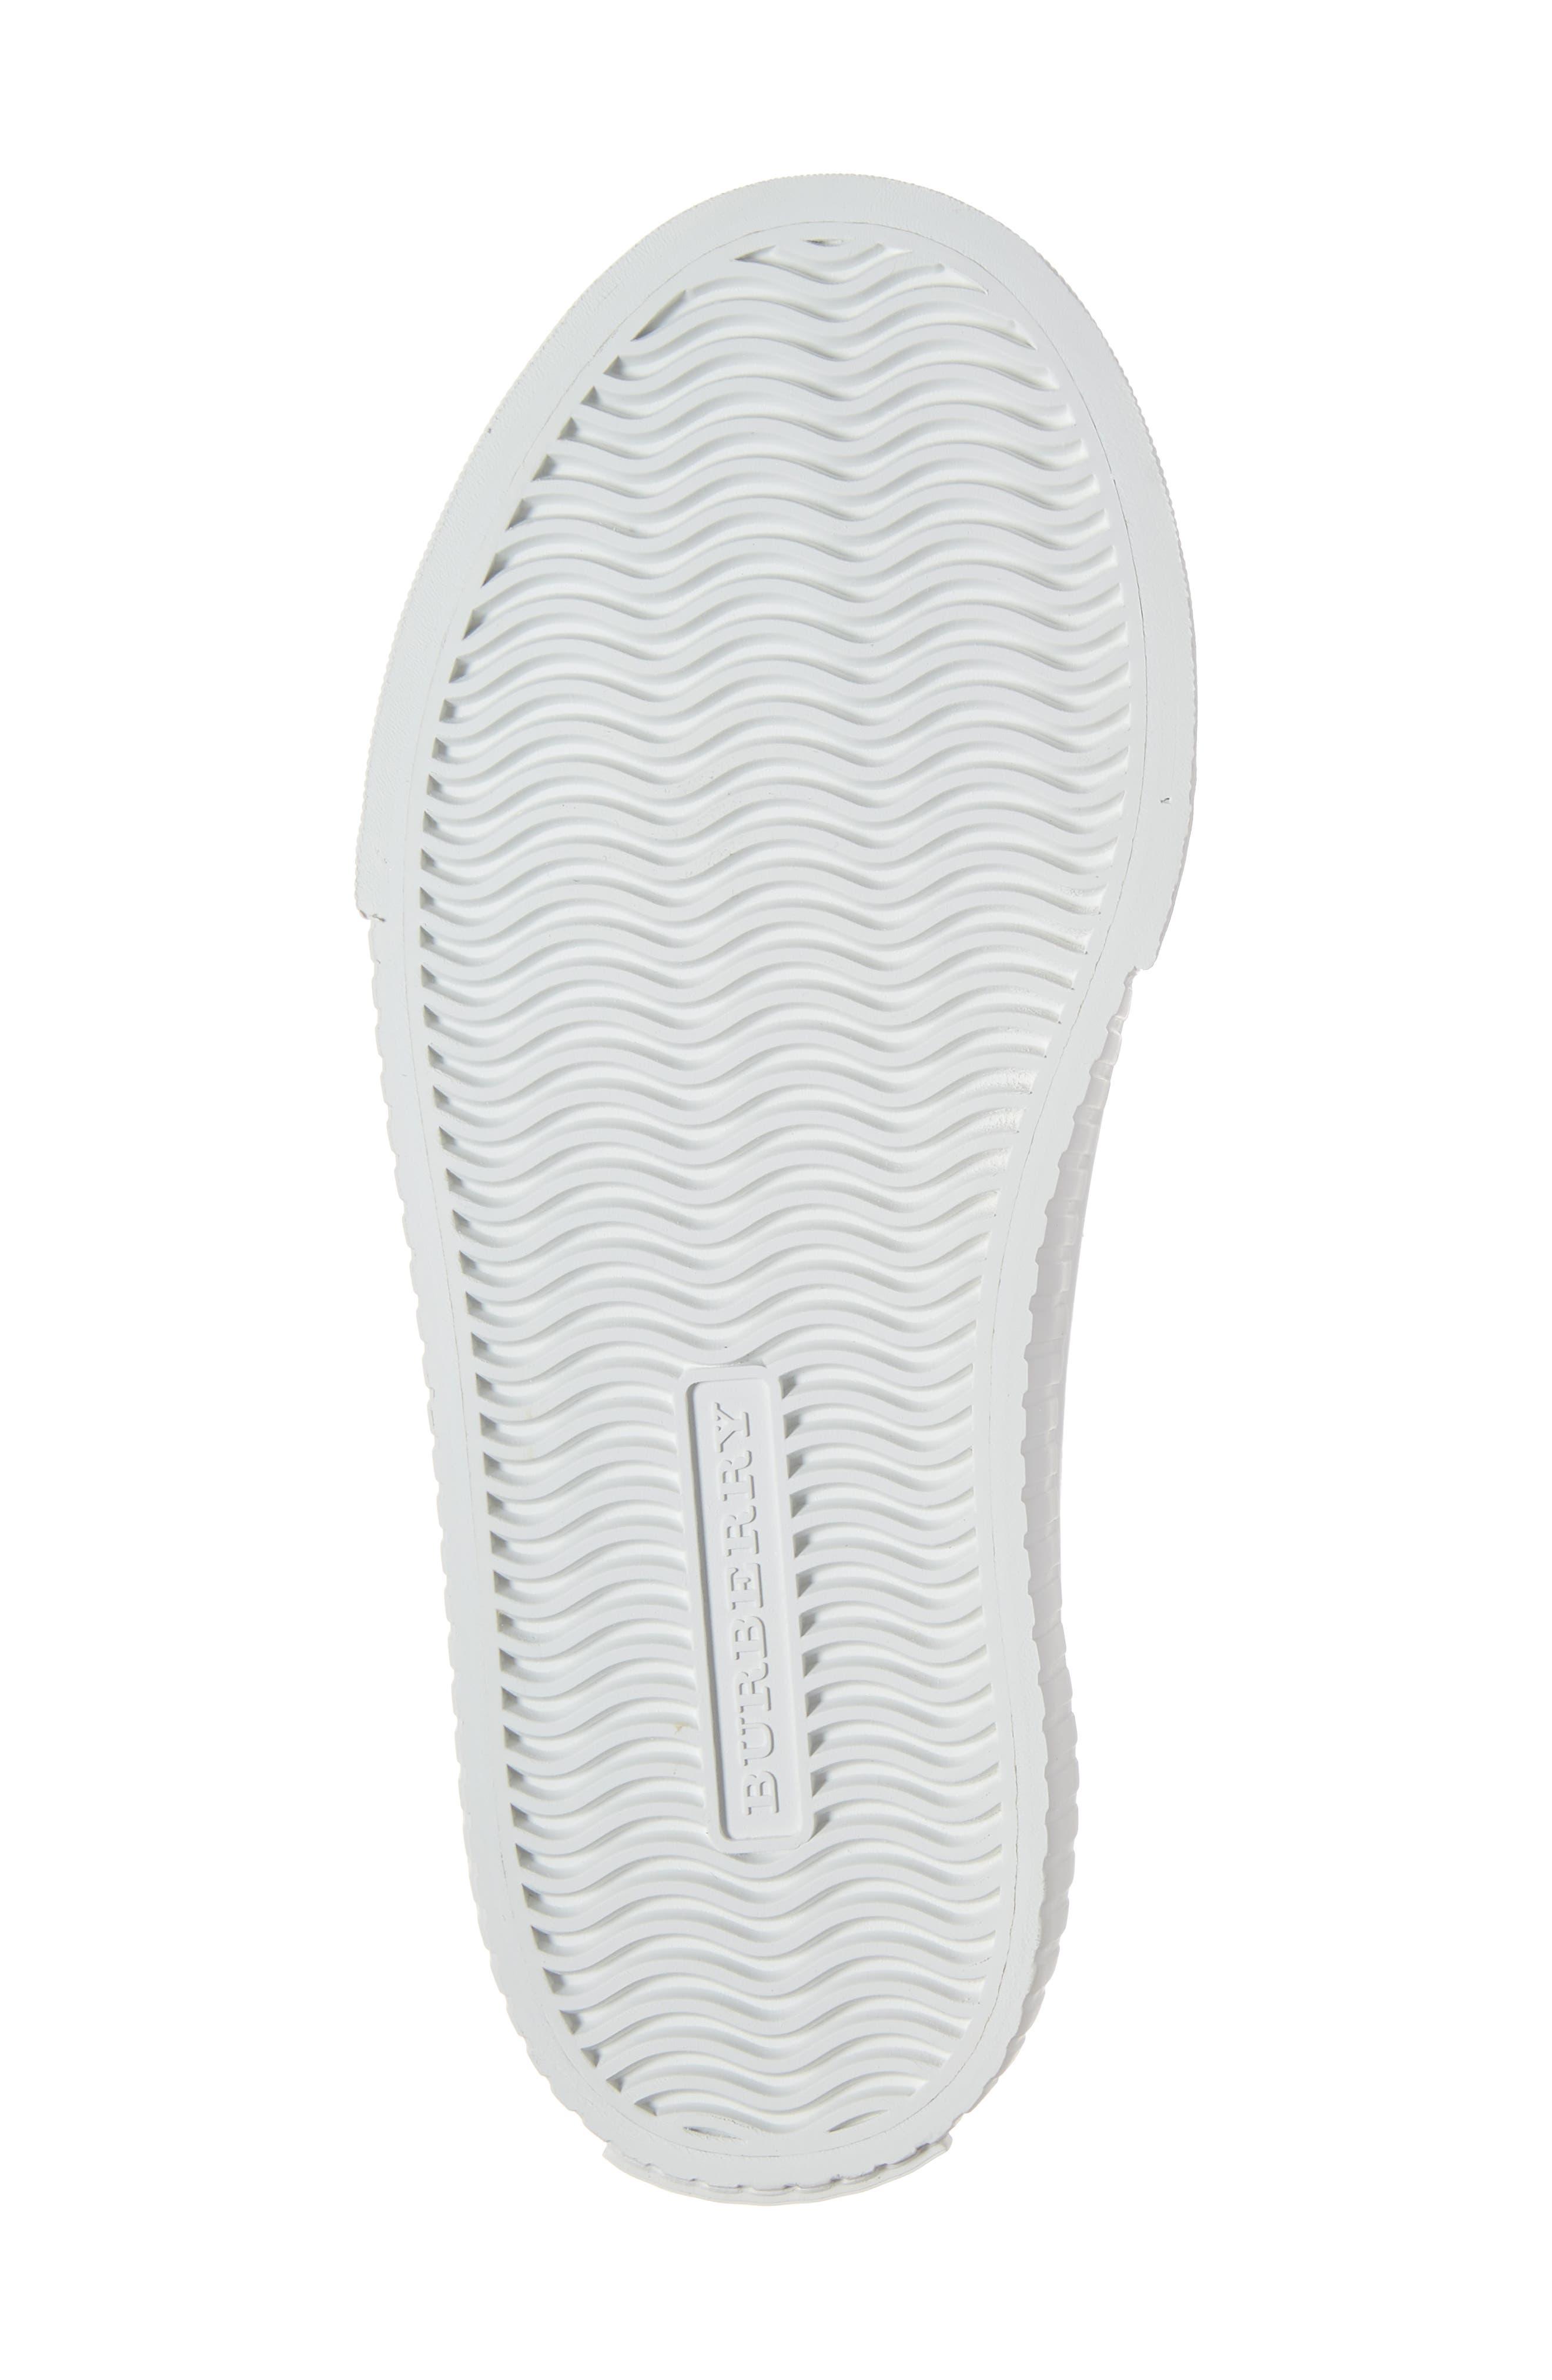 BURBERRY, Belside Sneaker, Alternate thumbnail 6, color, ANTIQUE YELLOW-OPTIC WHITE